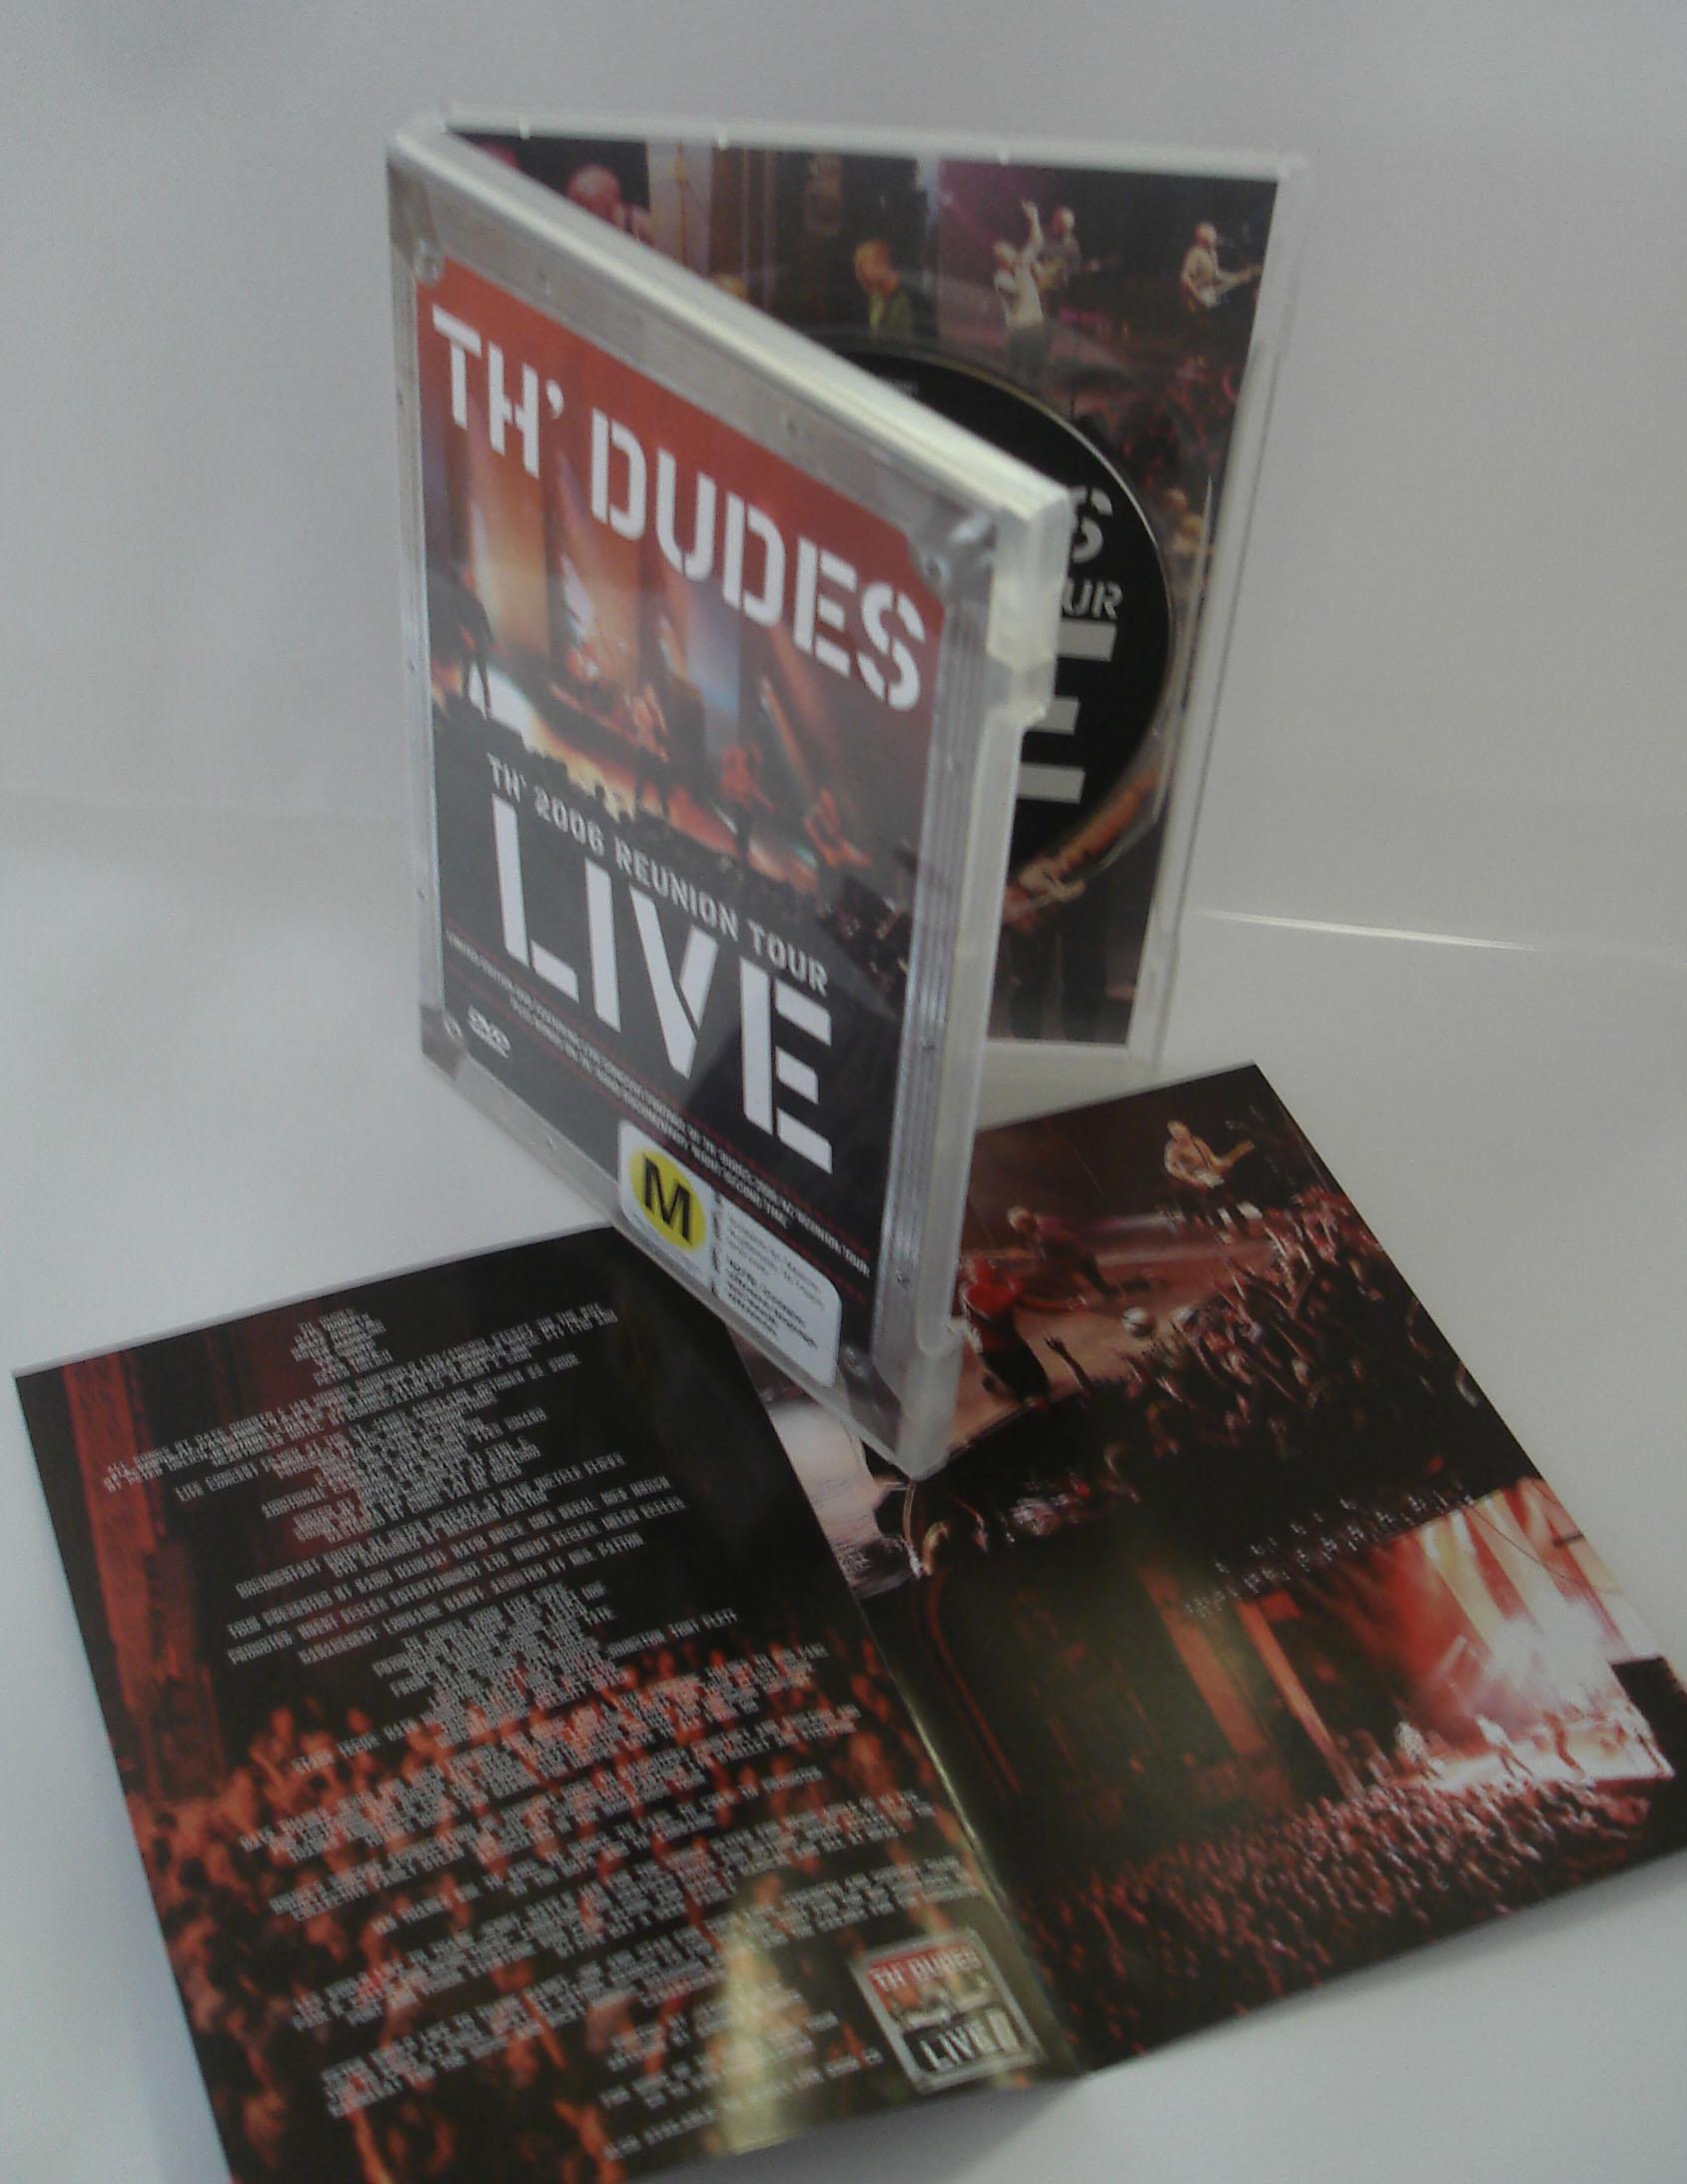 TH' DUDES - LIVE - CONCERT FILM - DVD